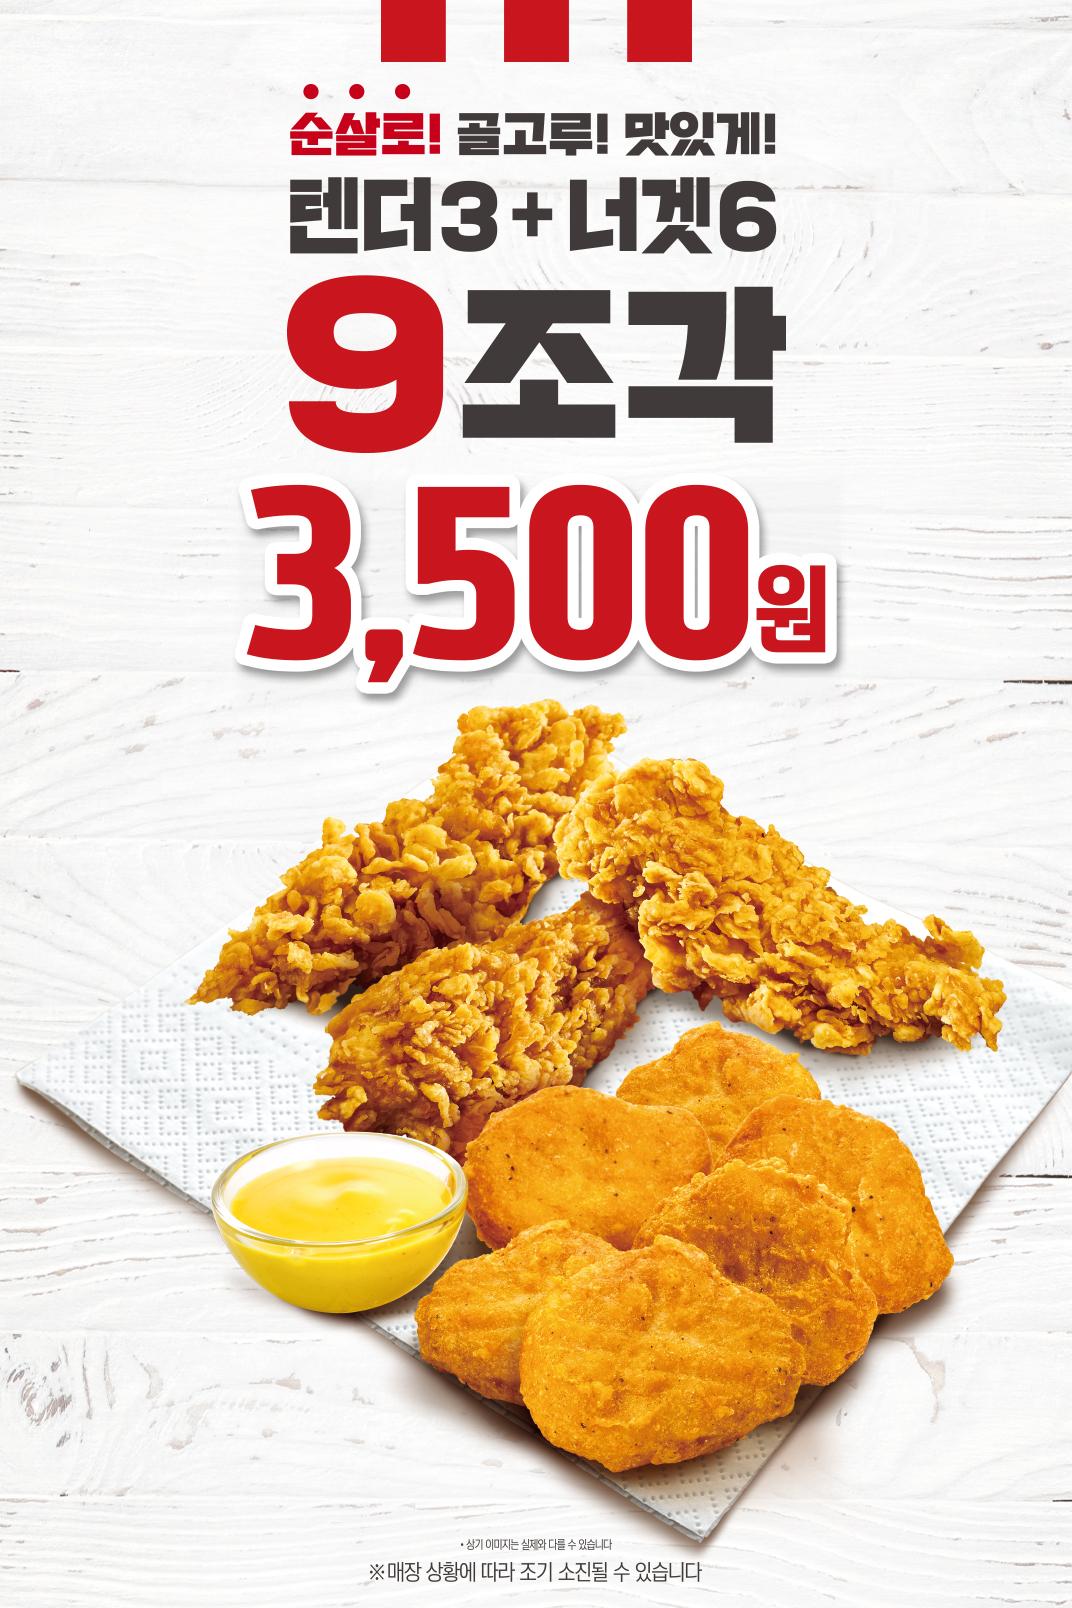 /article/thumbnail.asp?thumb=KFC%2Ejpg